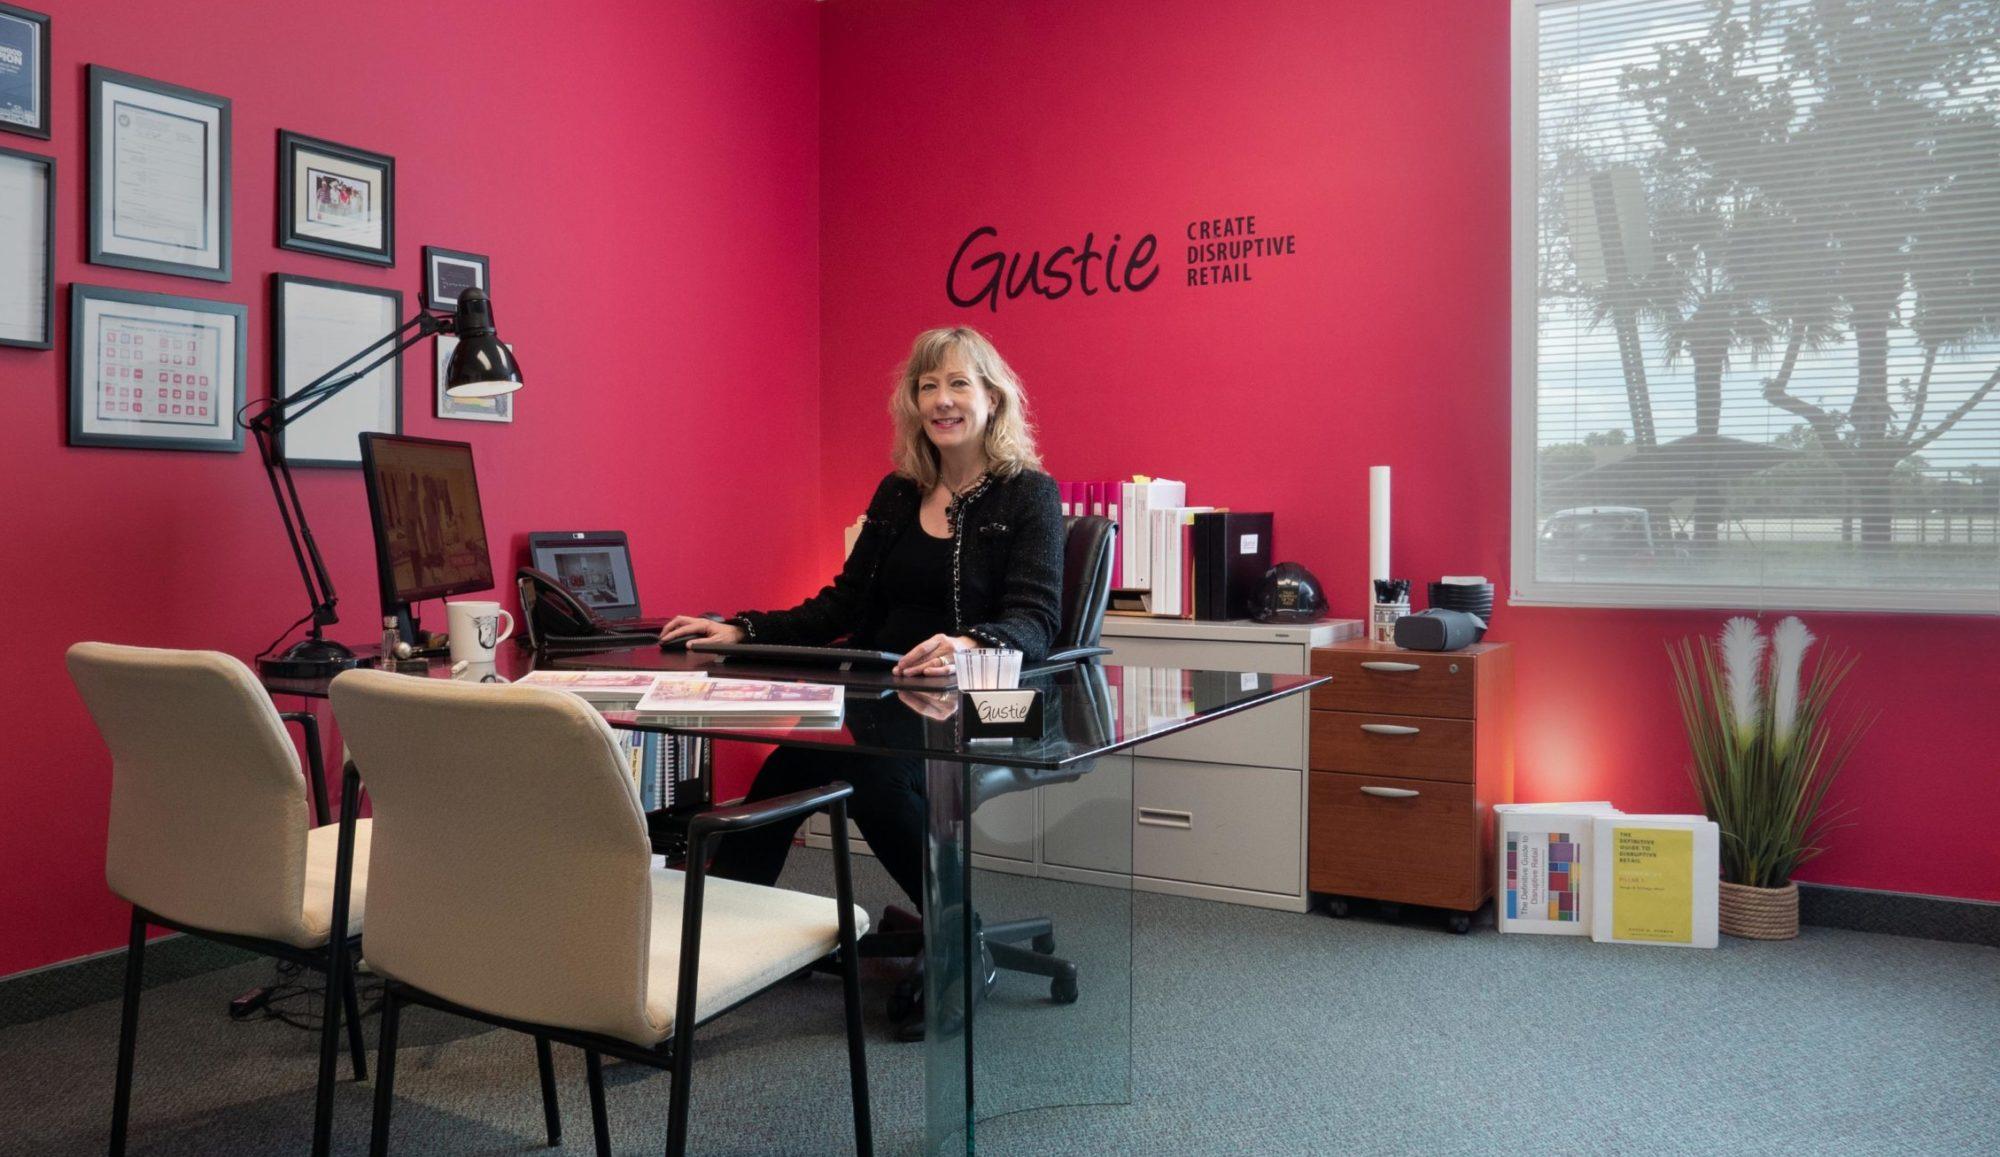 Gustie Creative